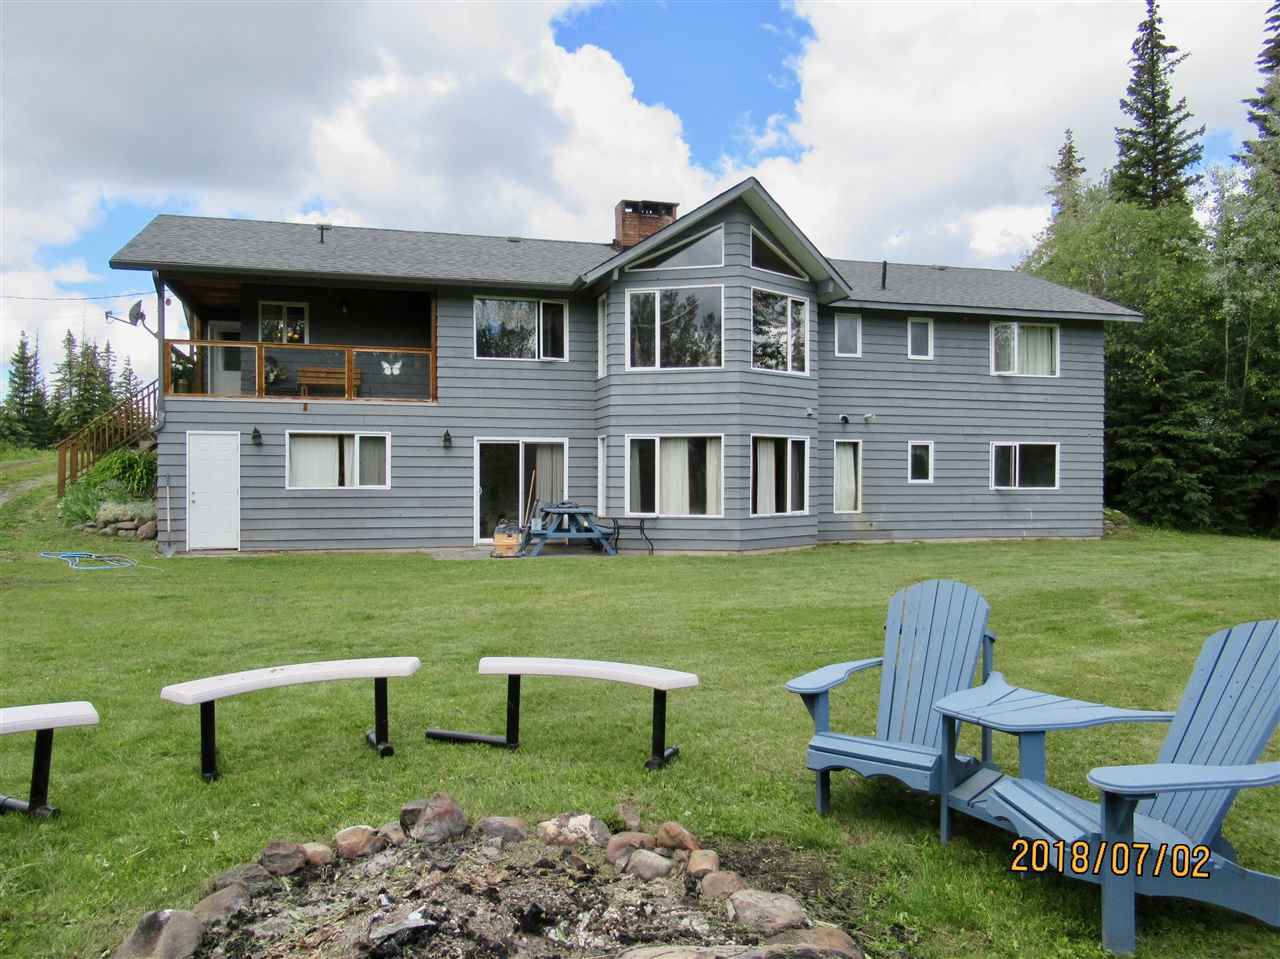 Main Photo: 3615 SPOKIN LAKE Road in Williams Lake: Williams Lake - Rural East House for sale (Williams Lake (Zone 27))  : MLS®# R2286081